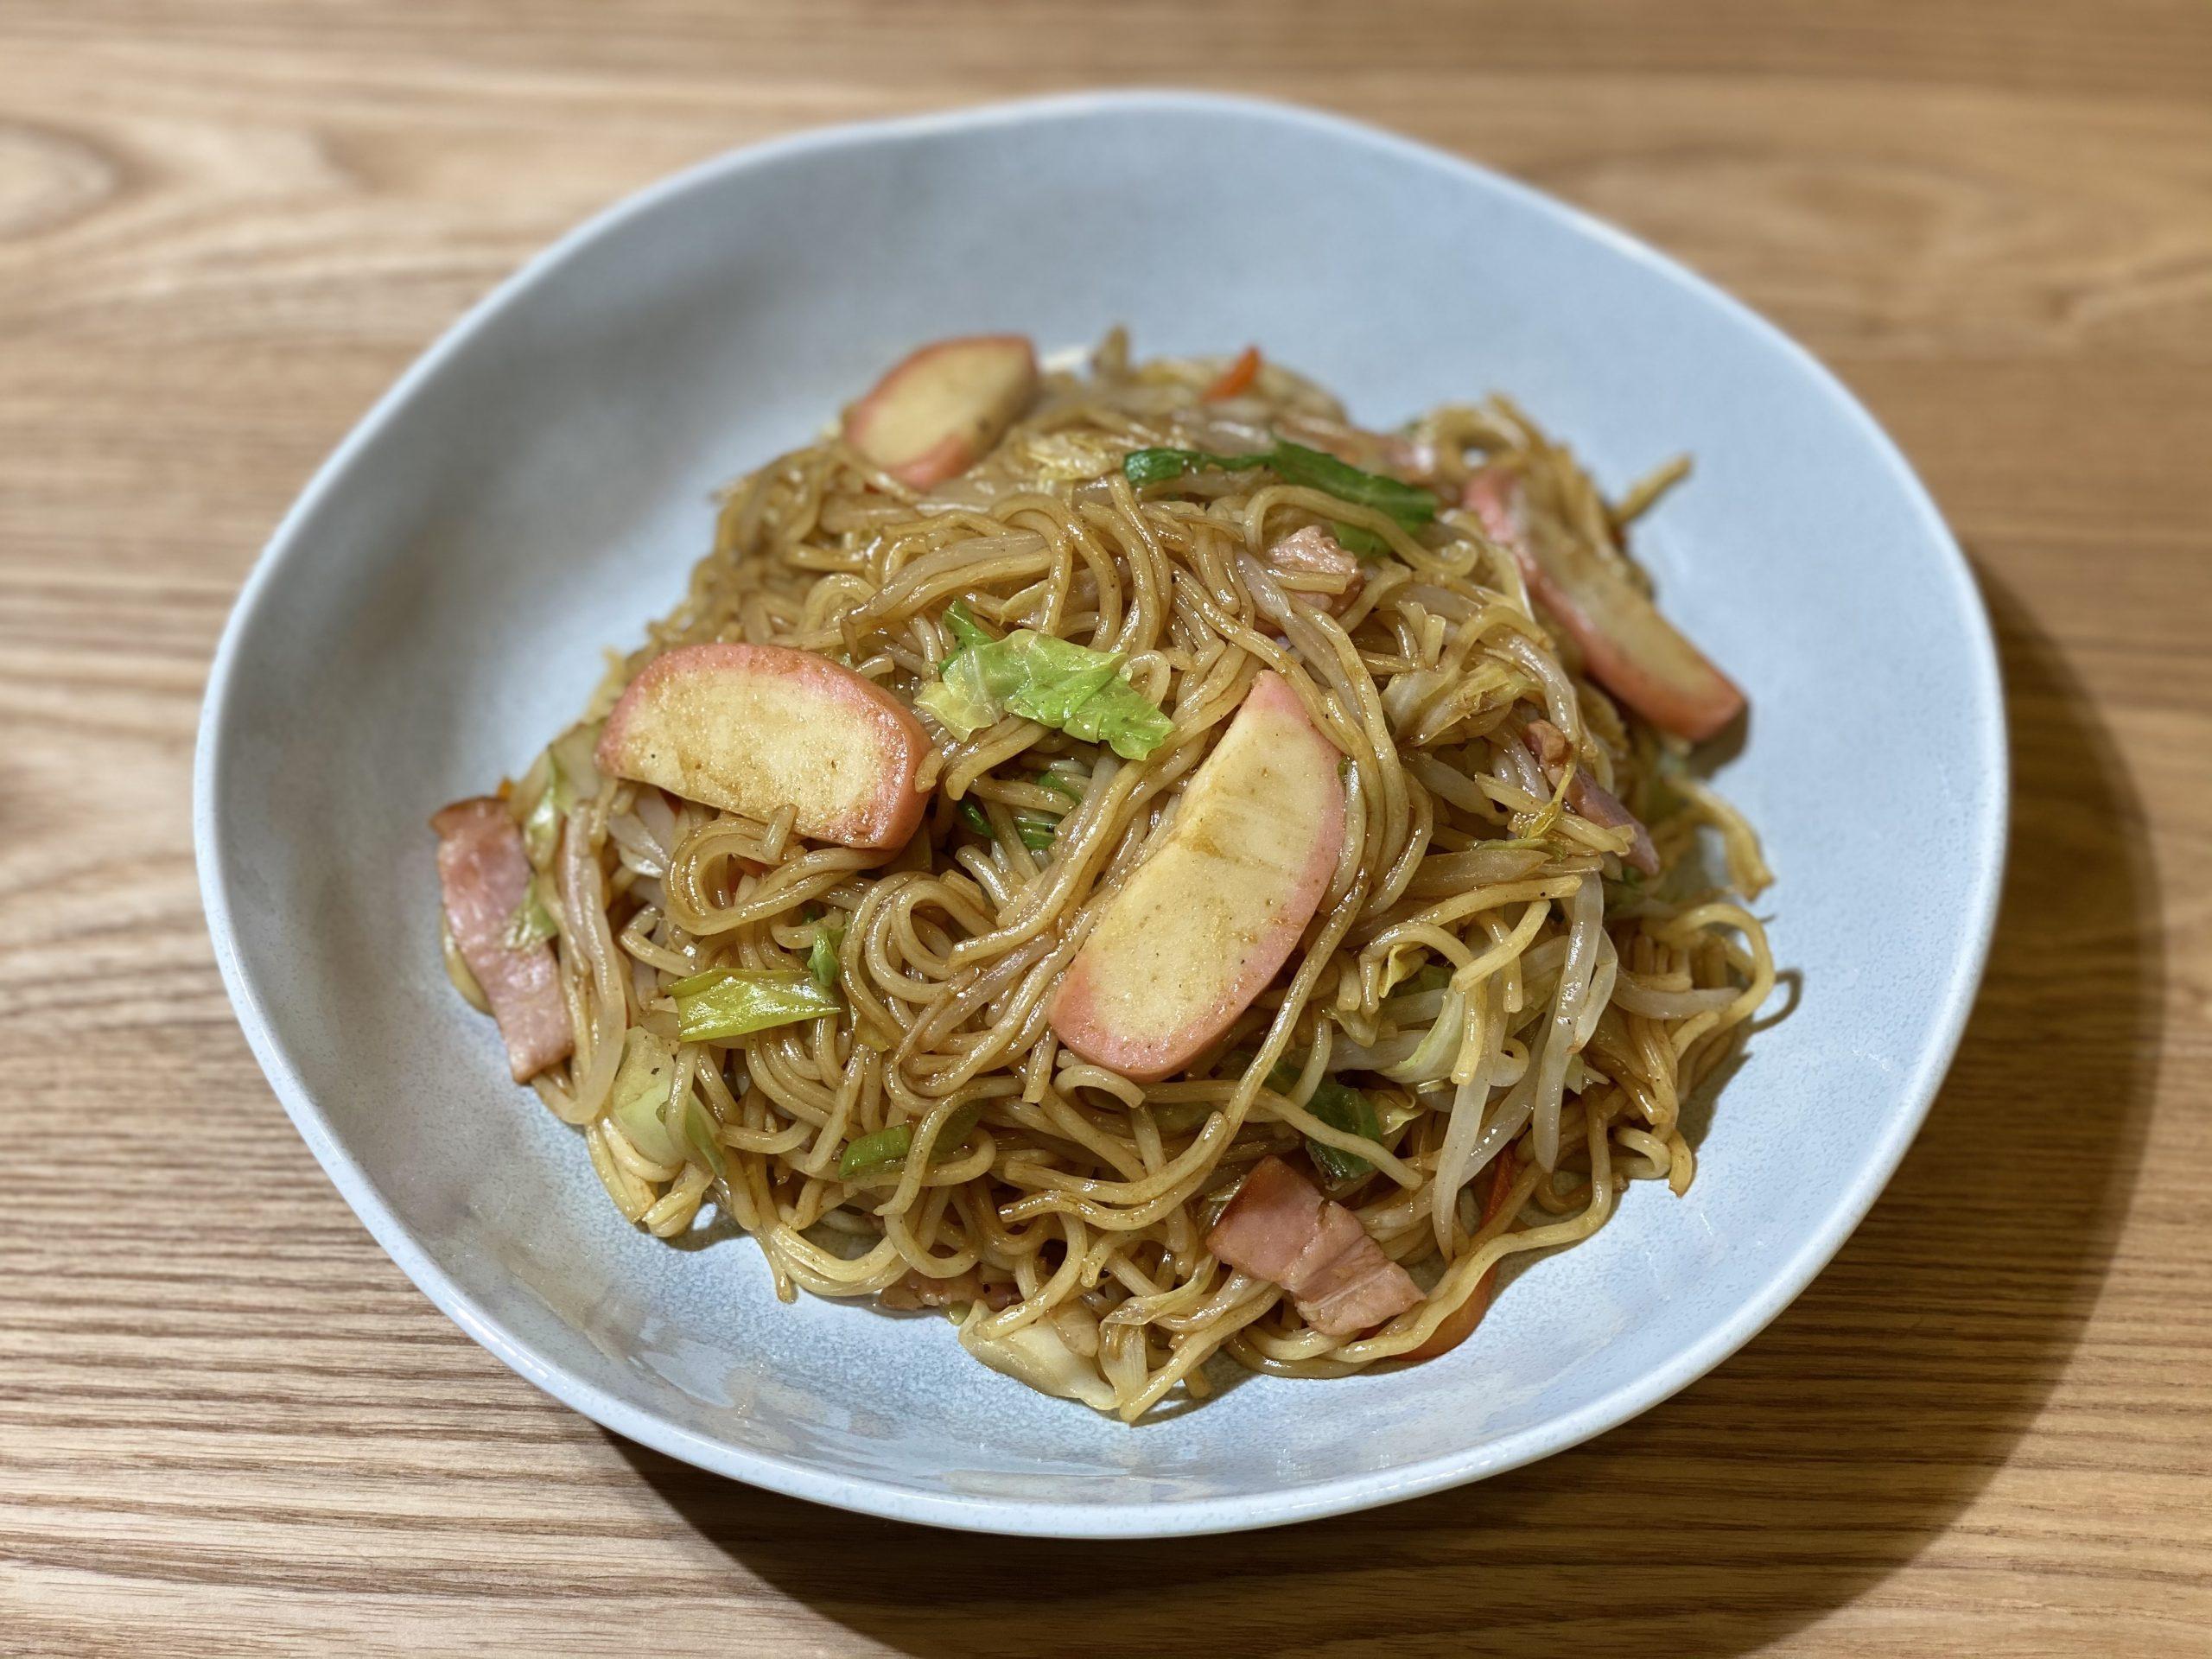 Olive家の簡単レシピ | 野菜たっぷり!かまぼこが入った焼きそば